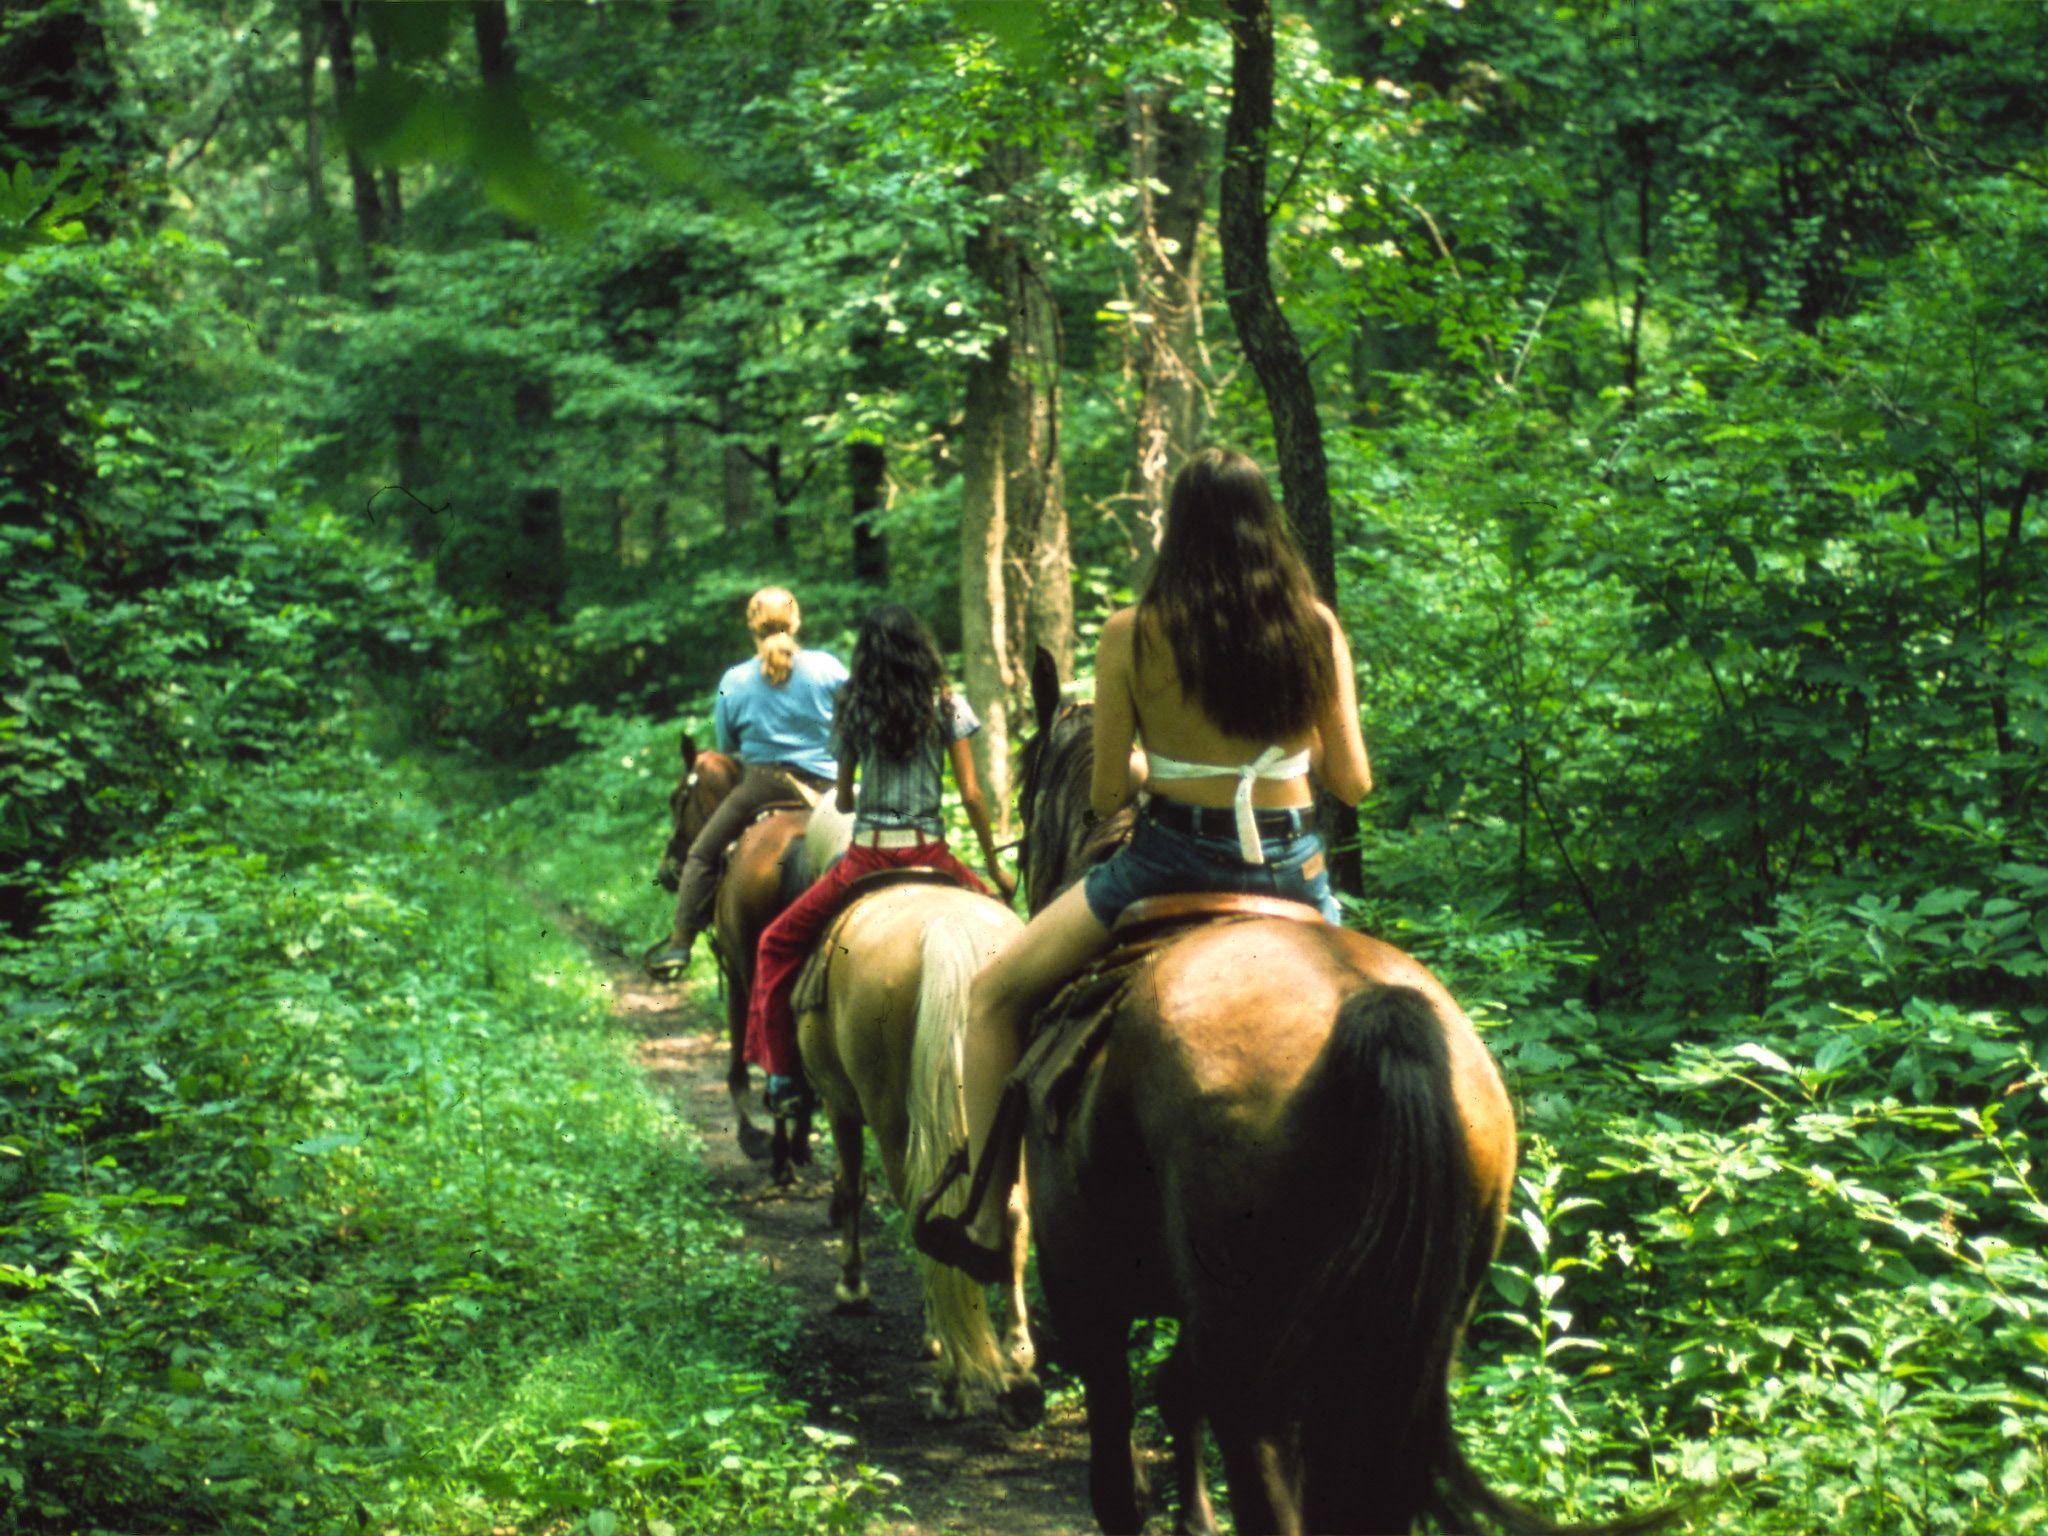 Horseback riding fairmont wv